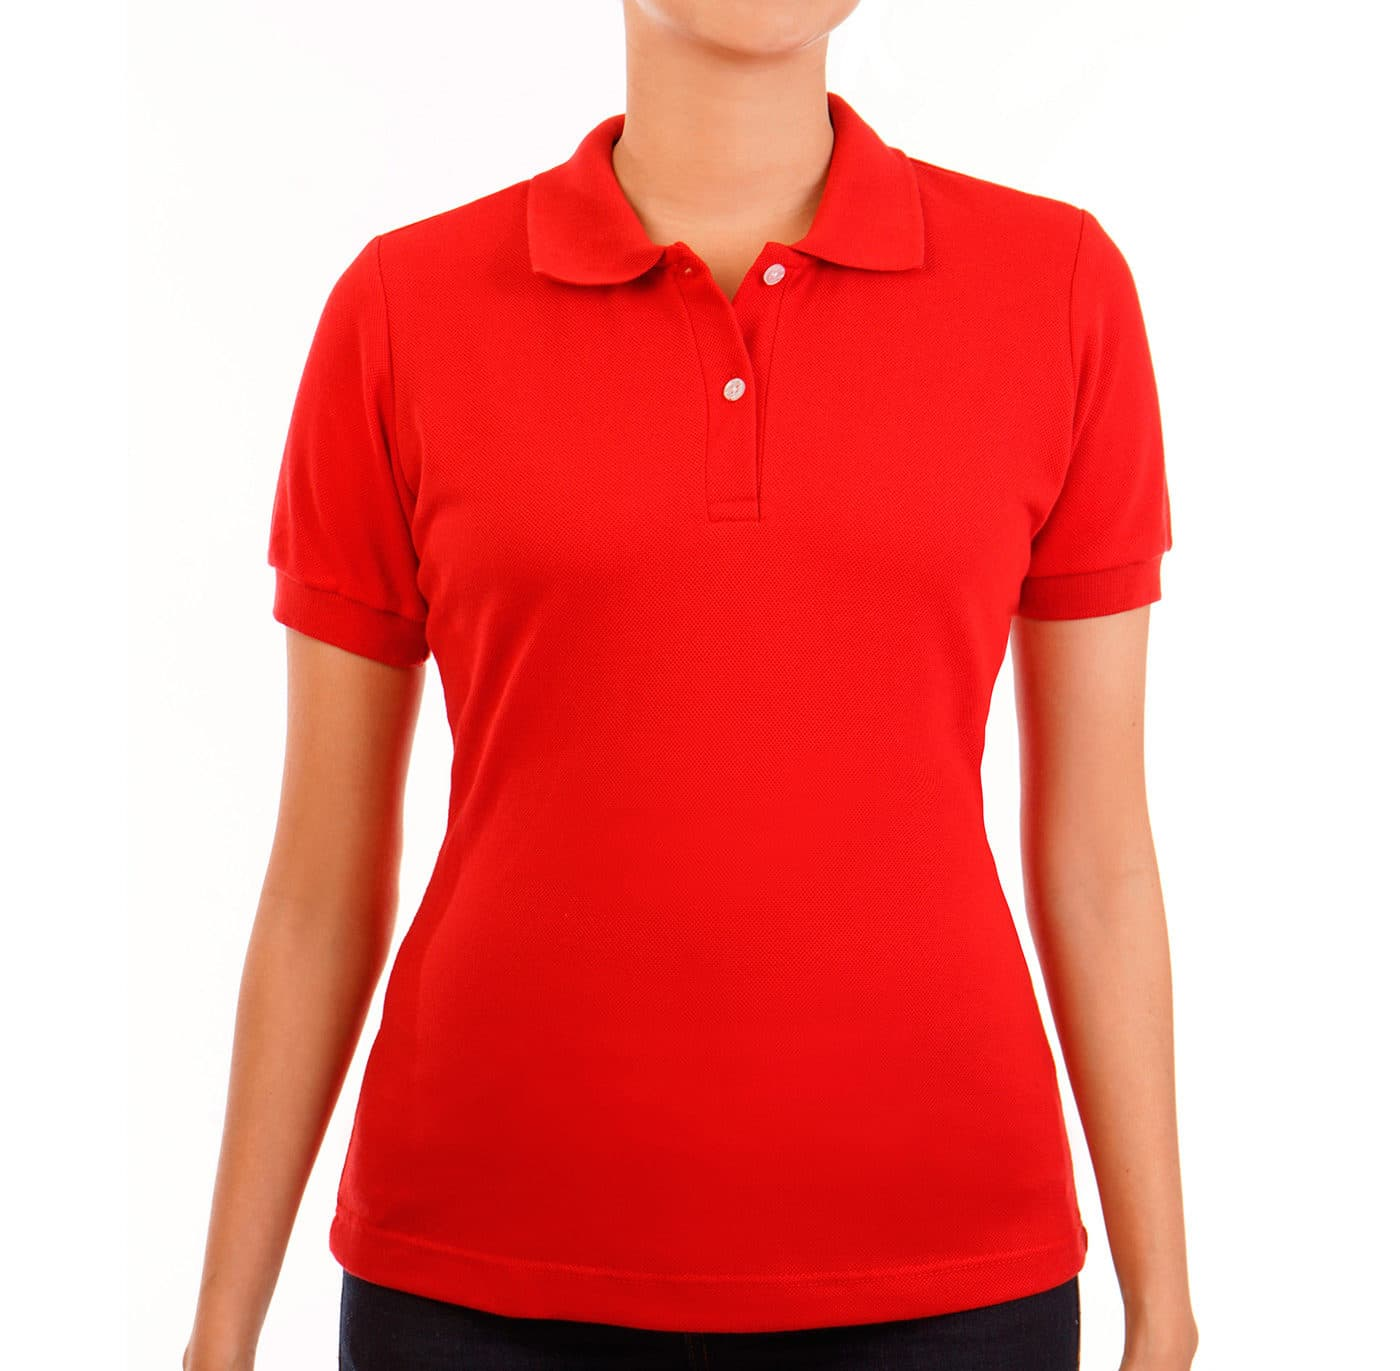 Camiseta Tipo Polo de Dama  ec1f1ac94635b